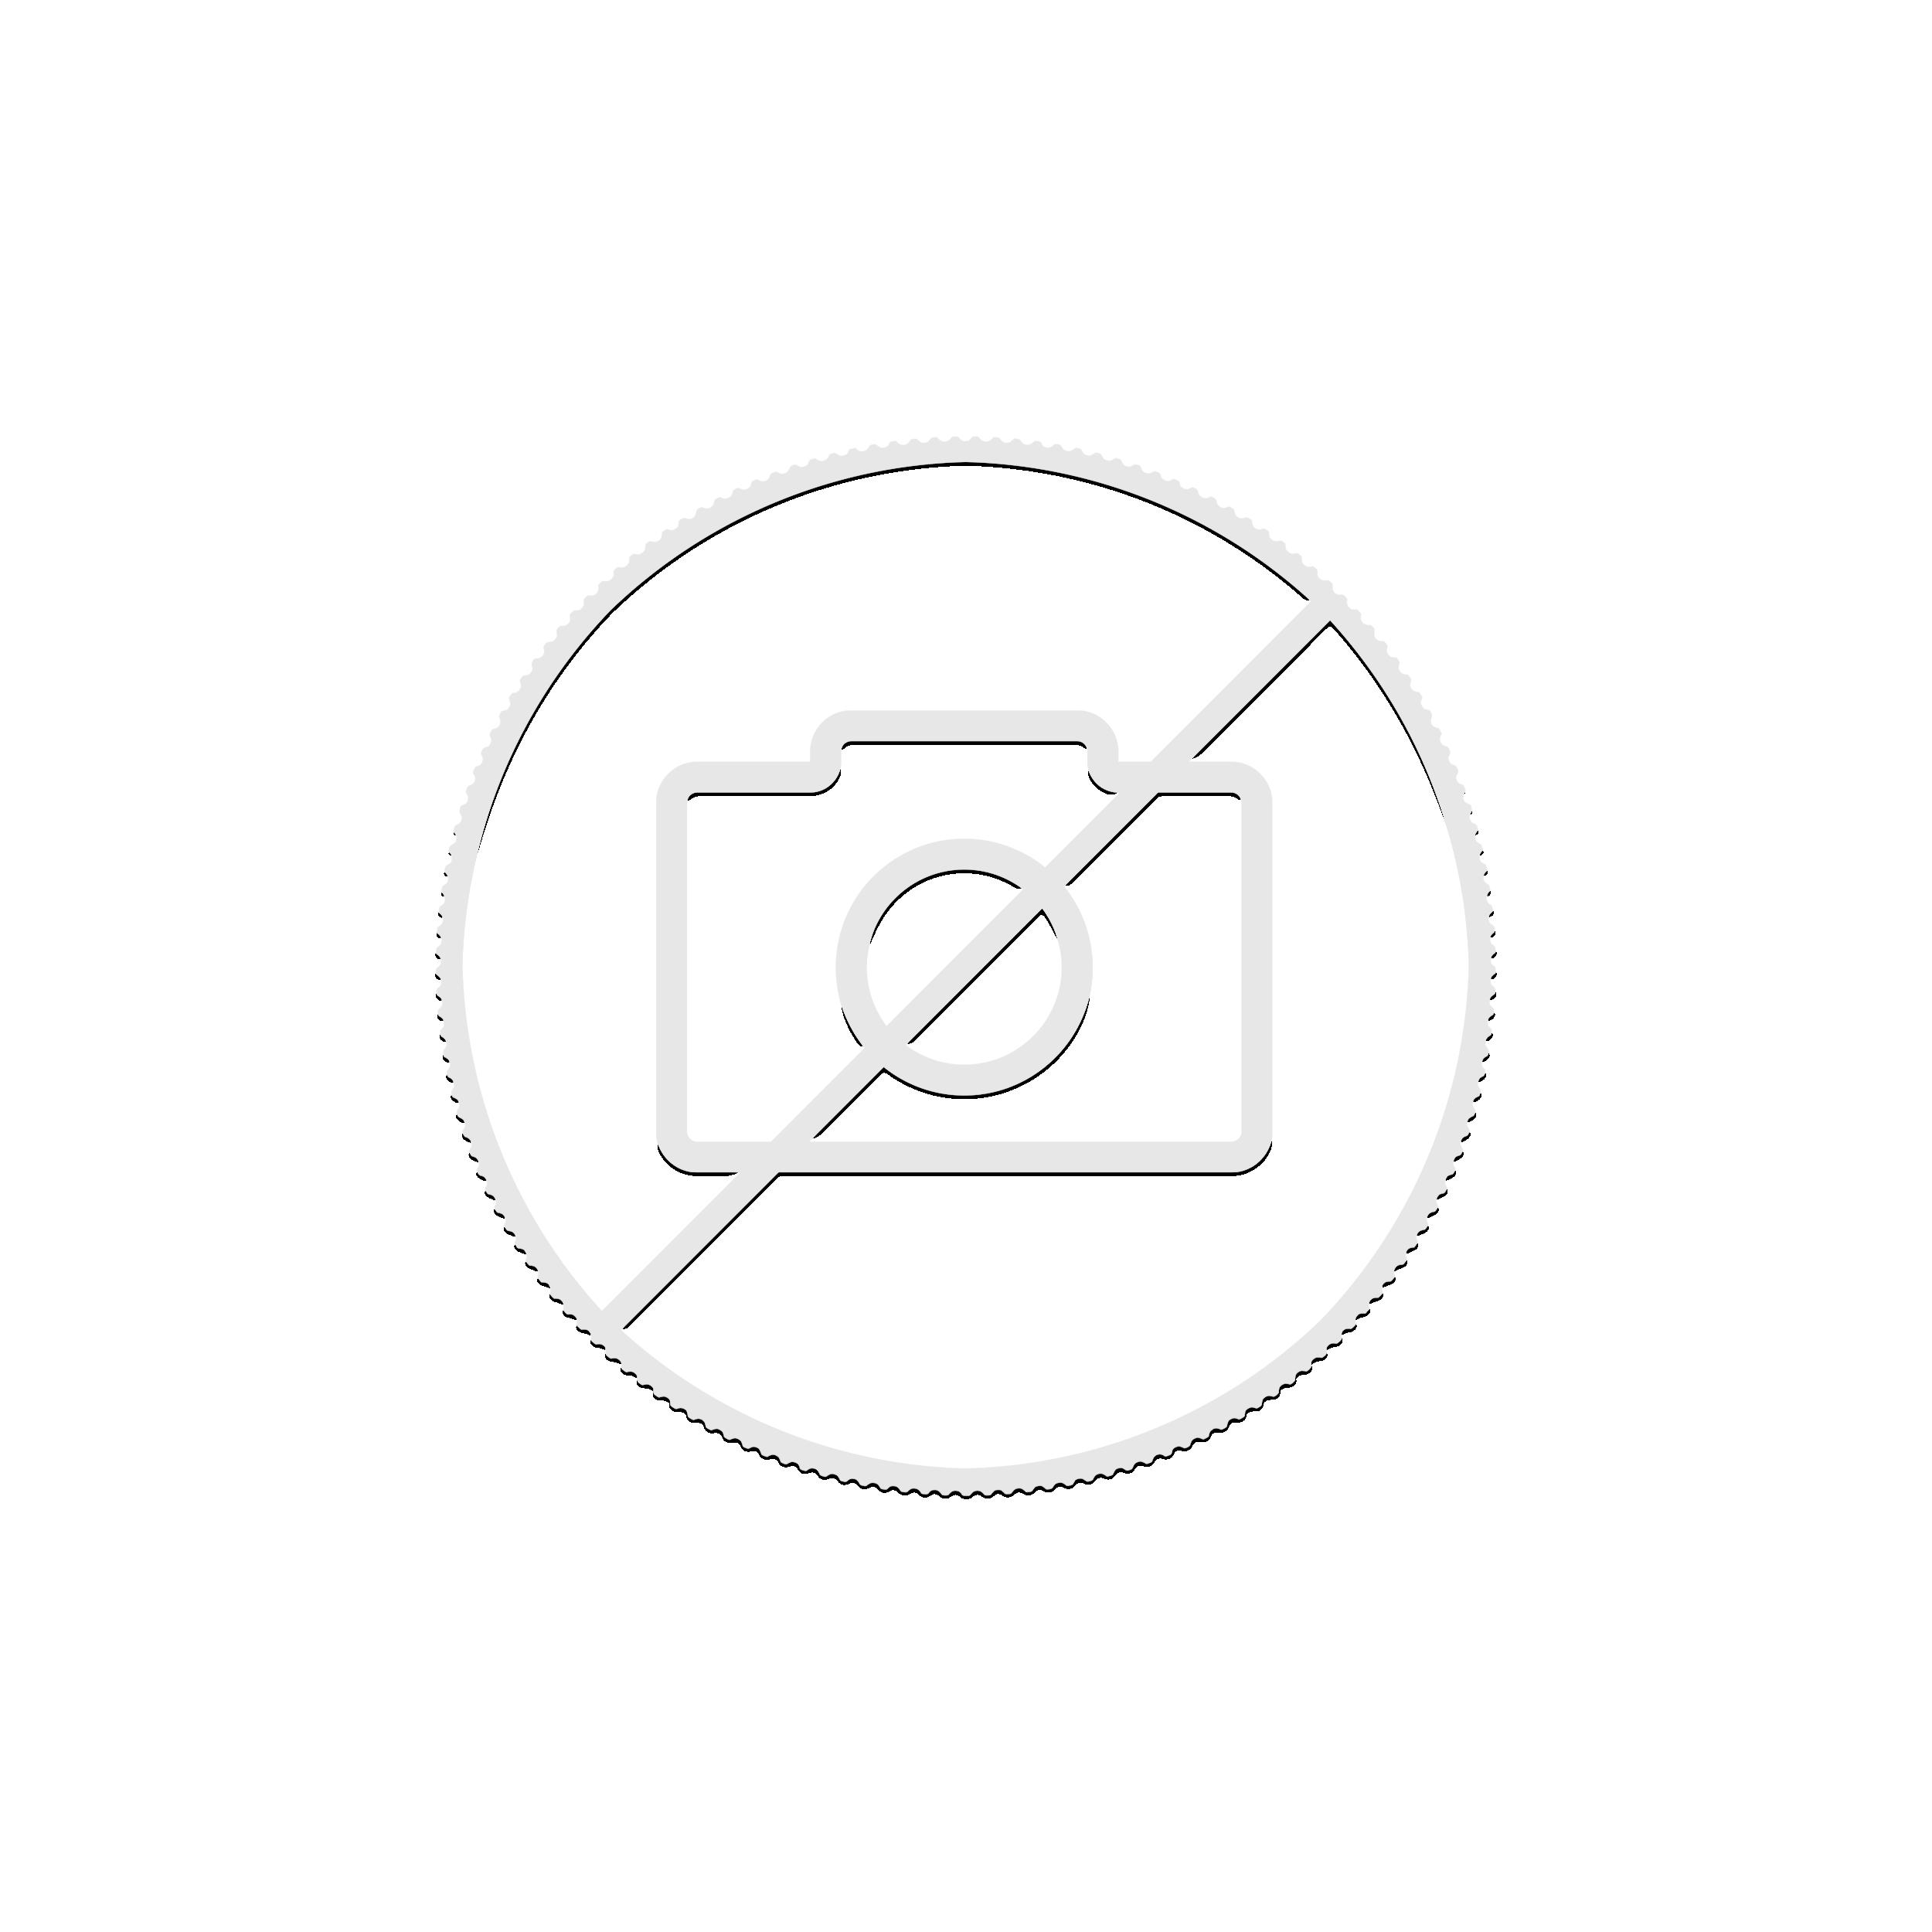 Goud baar 1 troy ounce C. Hafner